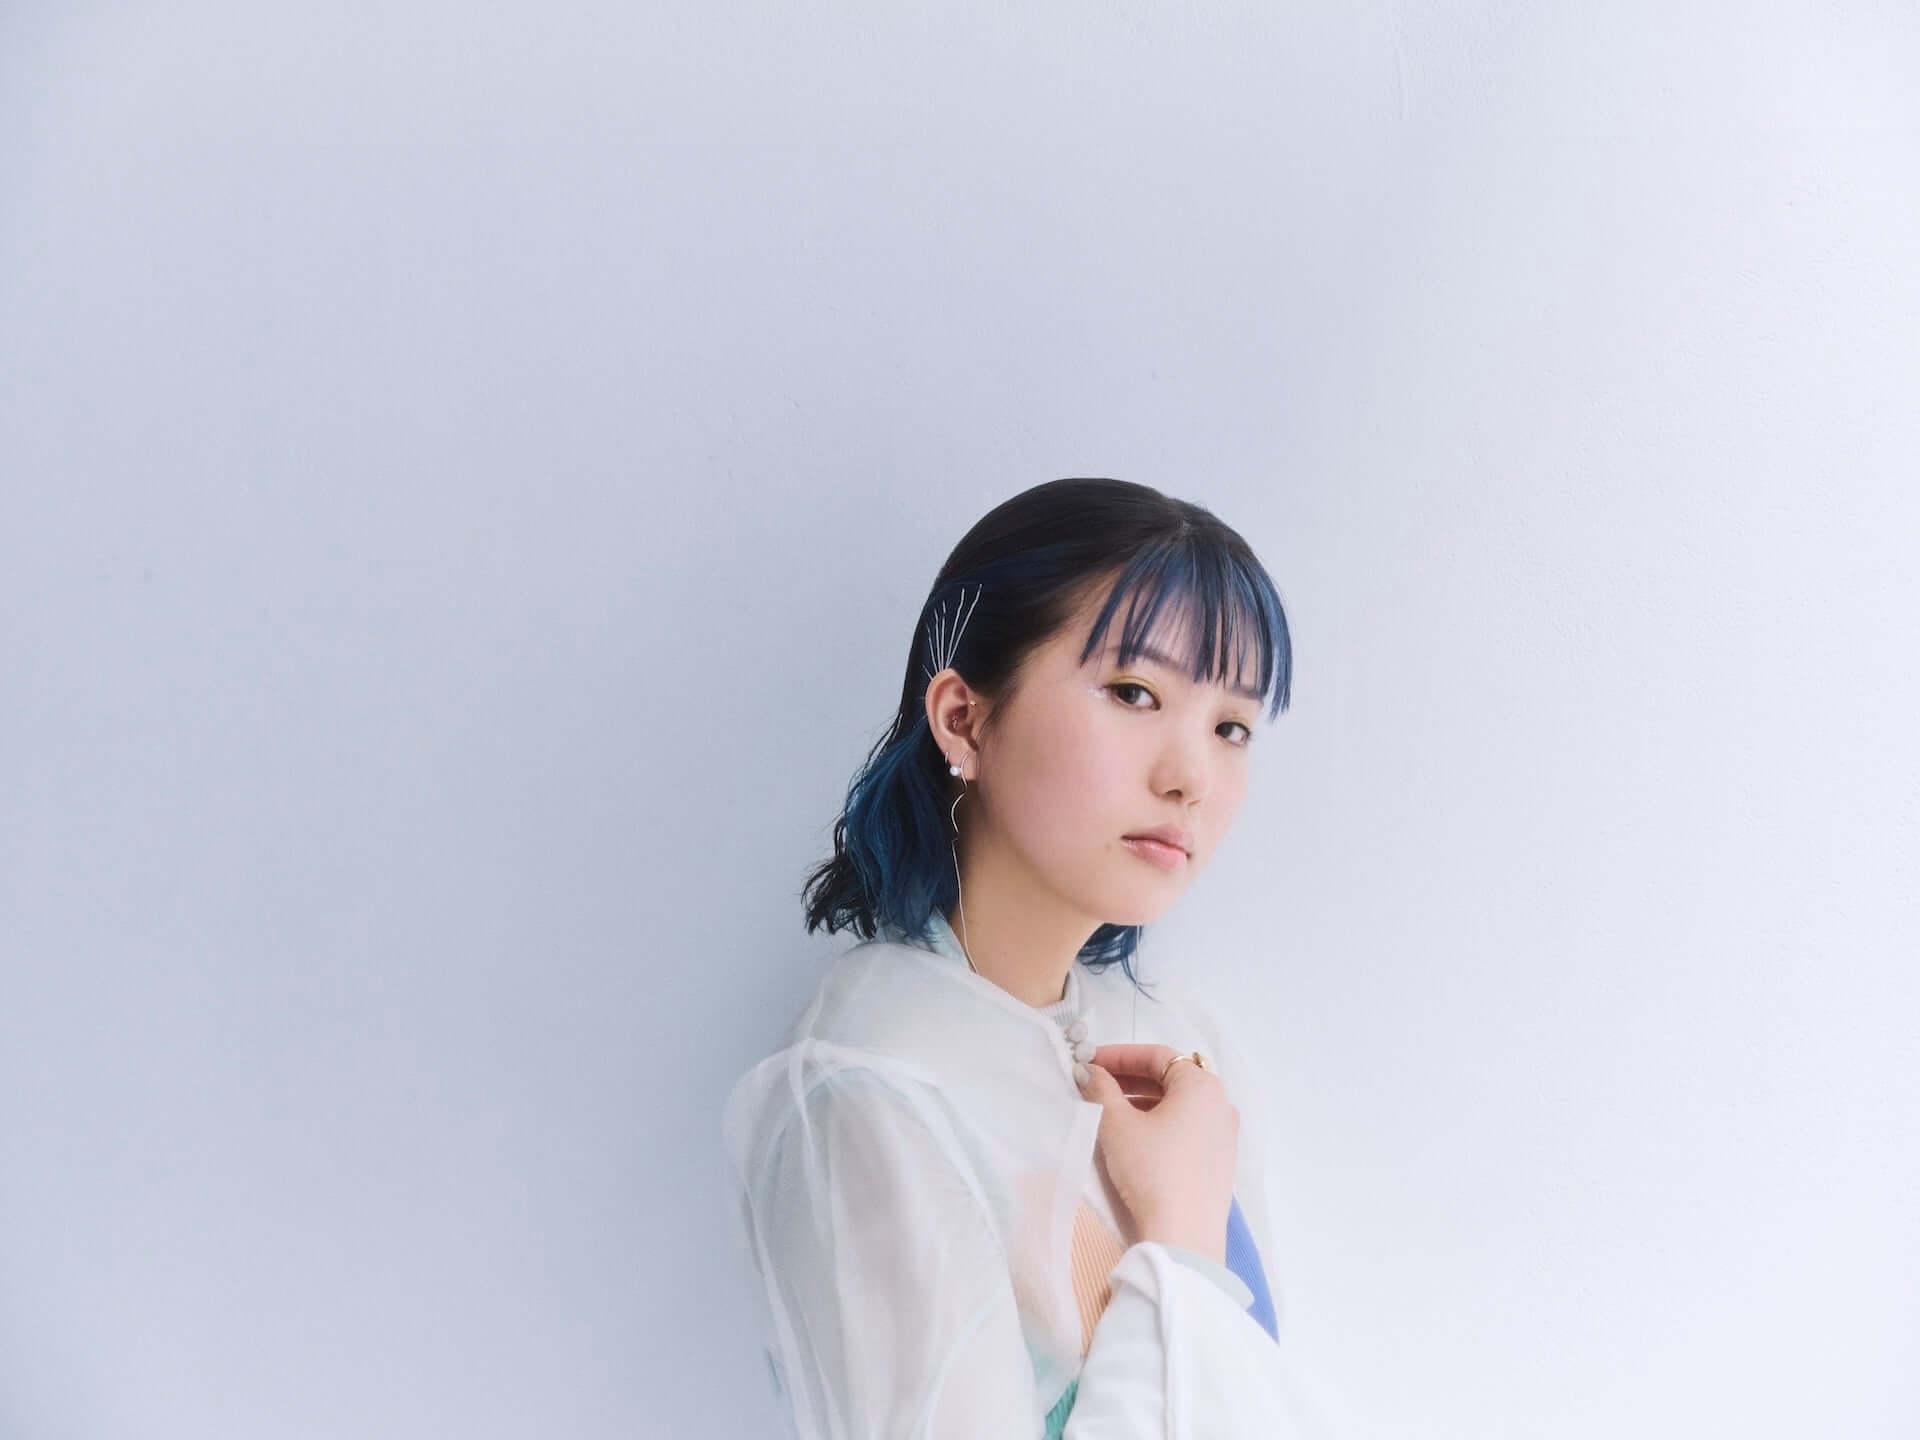 "80KIDZがYonYonを迎えた新曲""Your Closet""をリリース!渋谷studio Wでのクリスマスライブでも披露 music201223_80kidz_3-1920x1440"